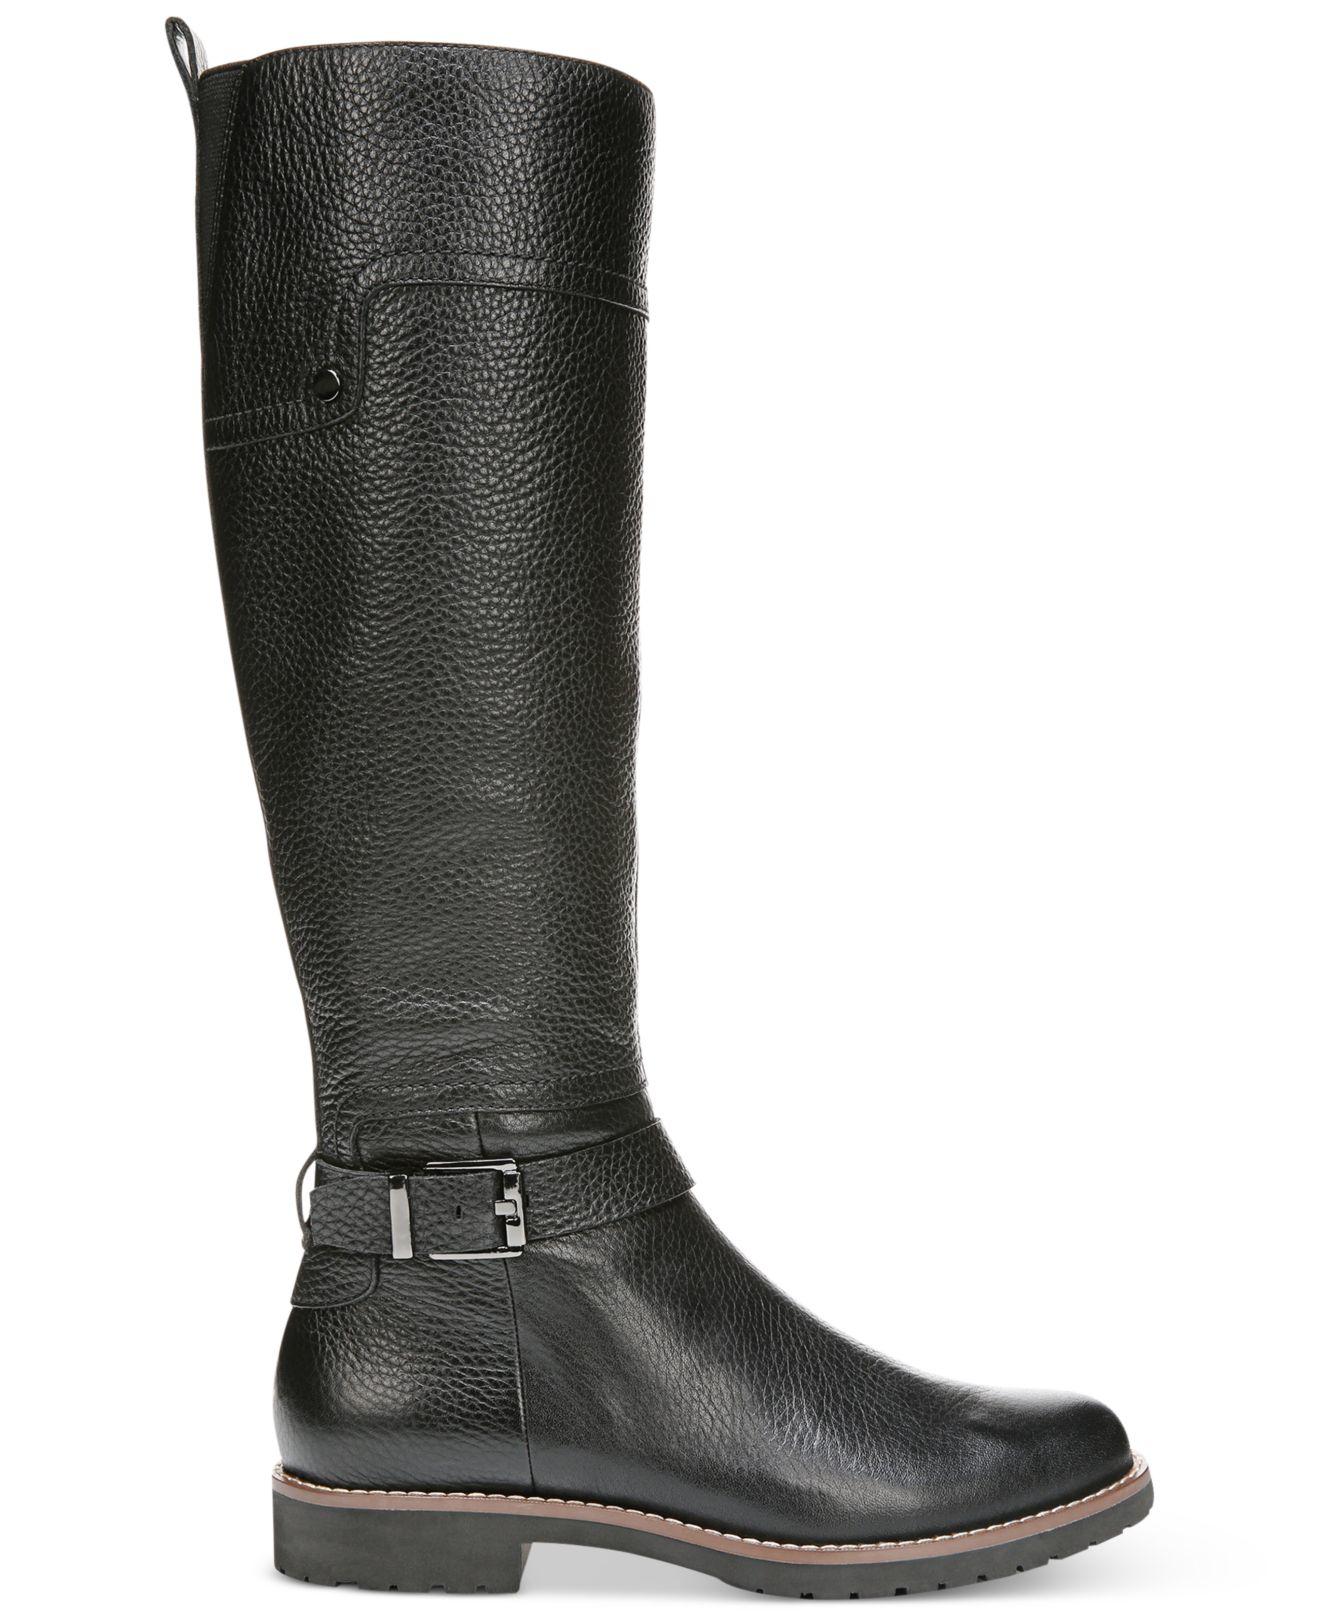 2b9d8d6c0 Buy Franco Sarto Women's Boots Online at Overstock.com